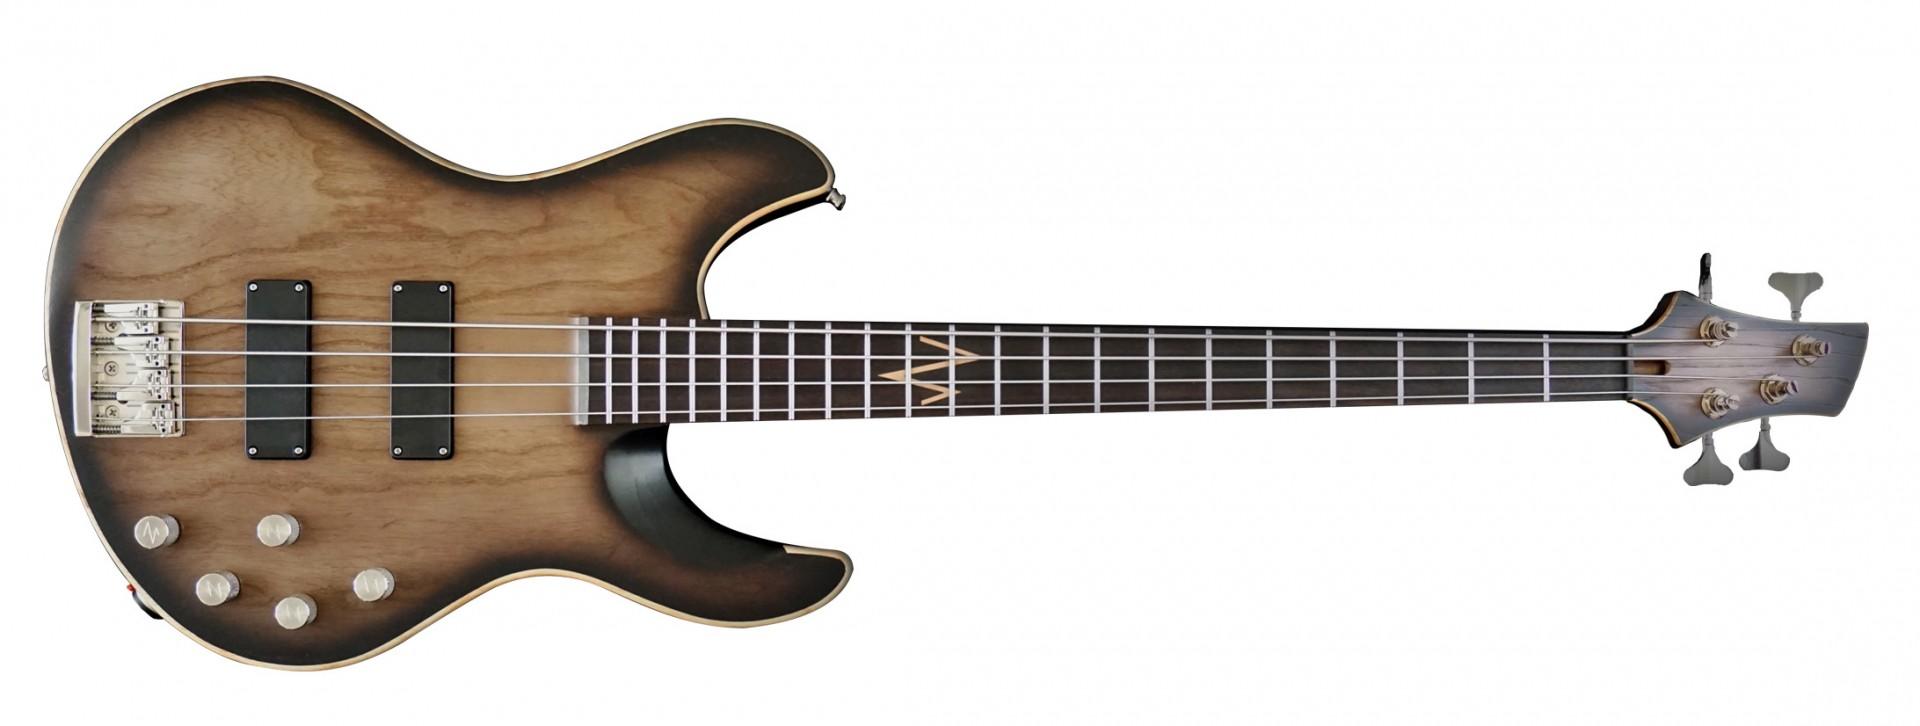 Radiant 4 Bass